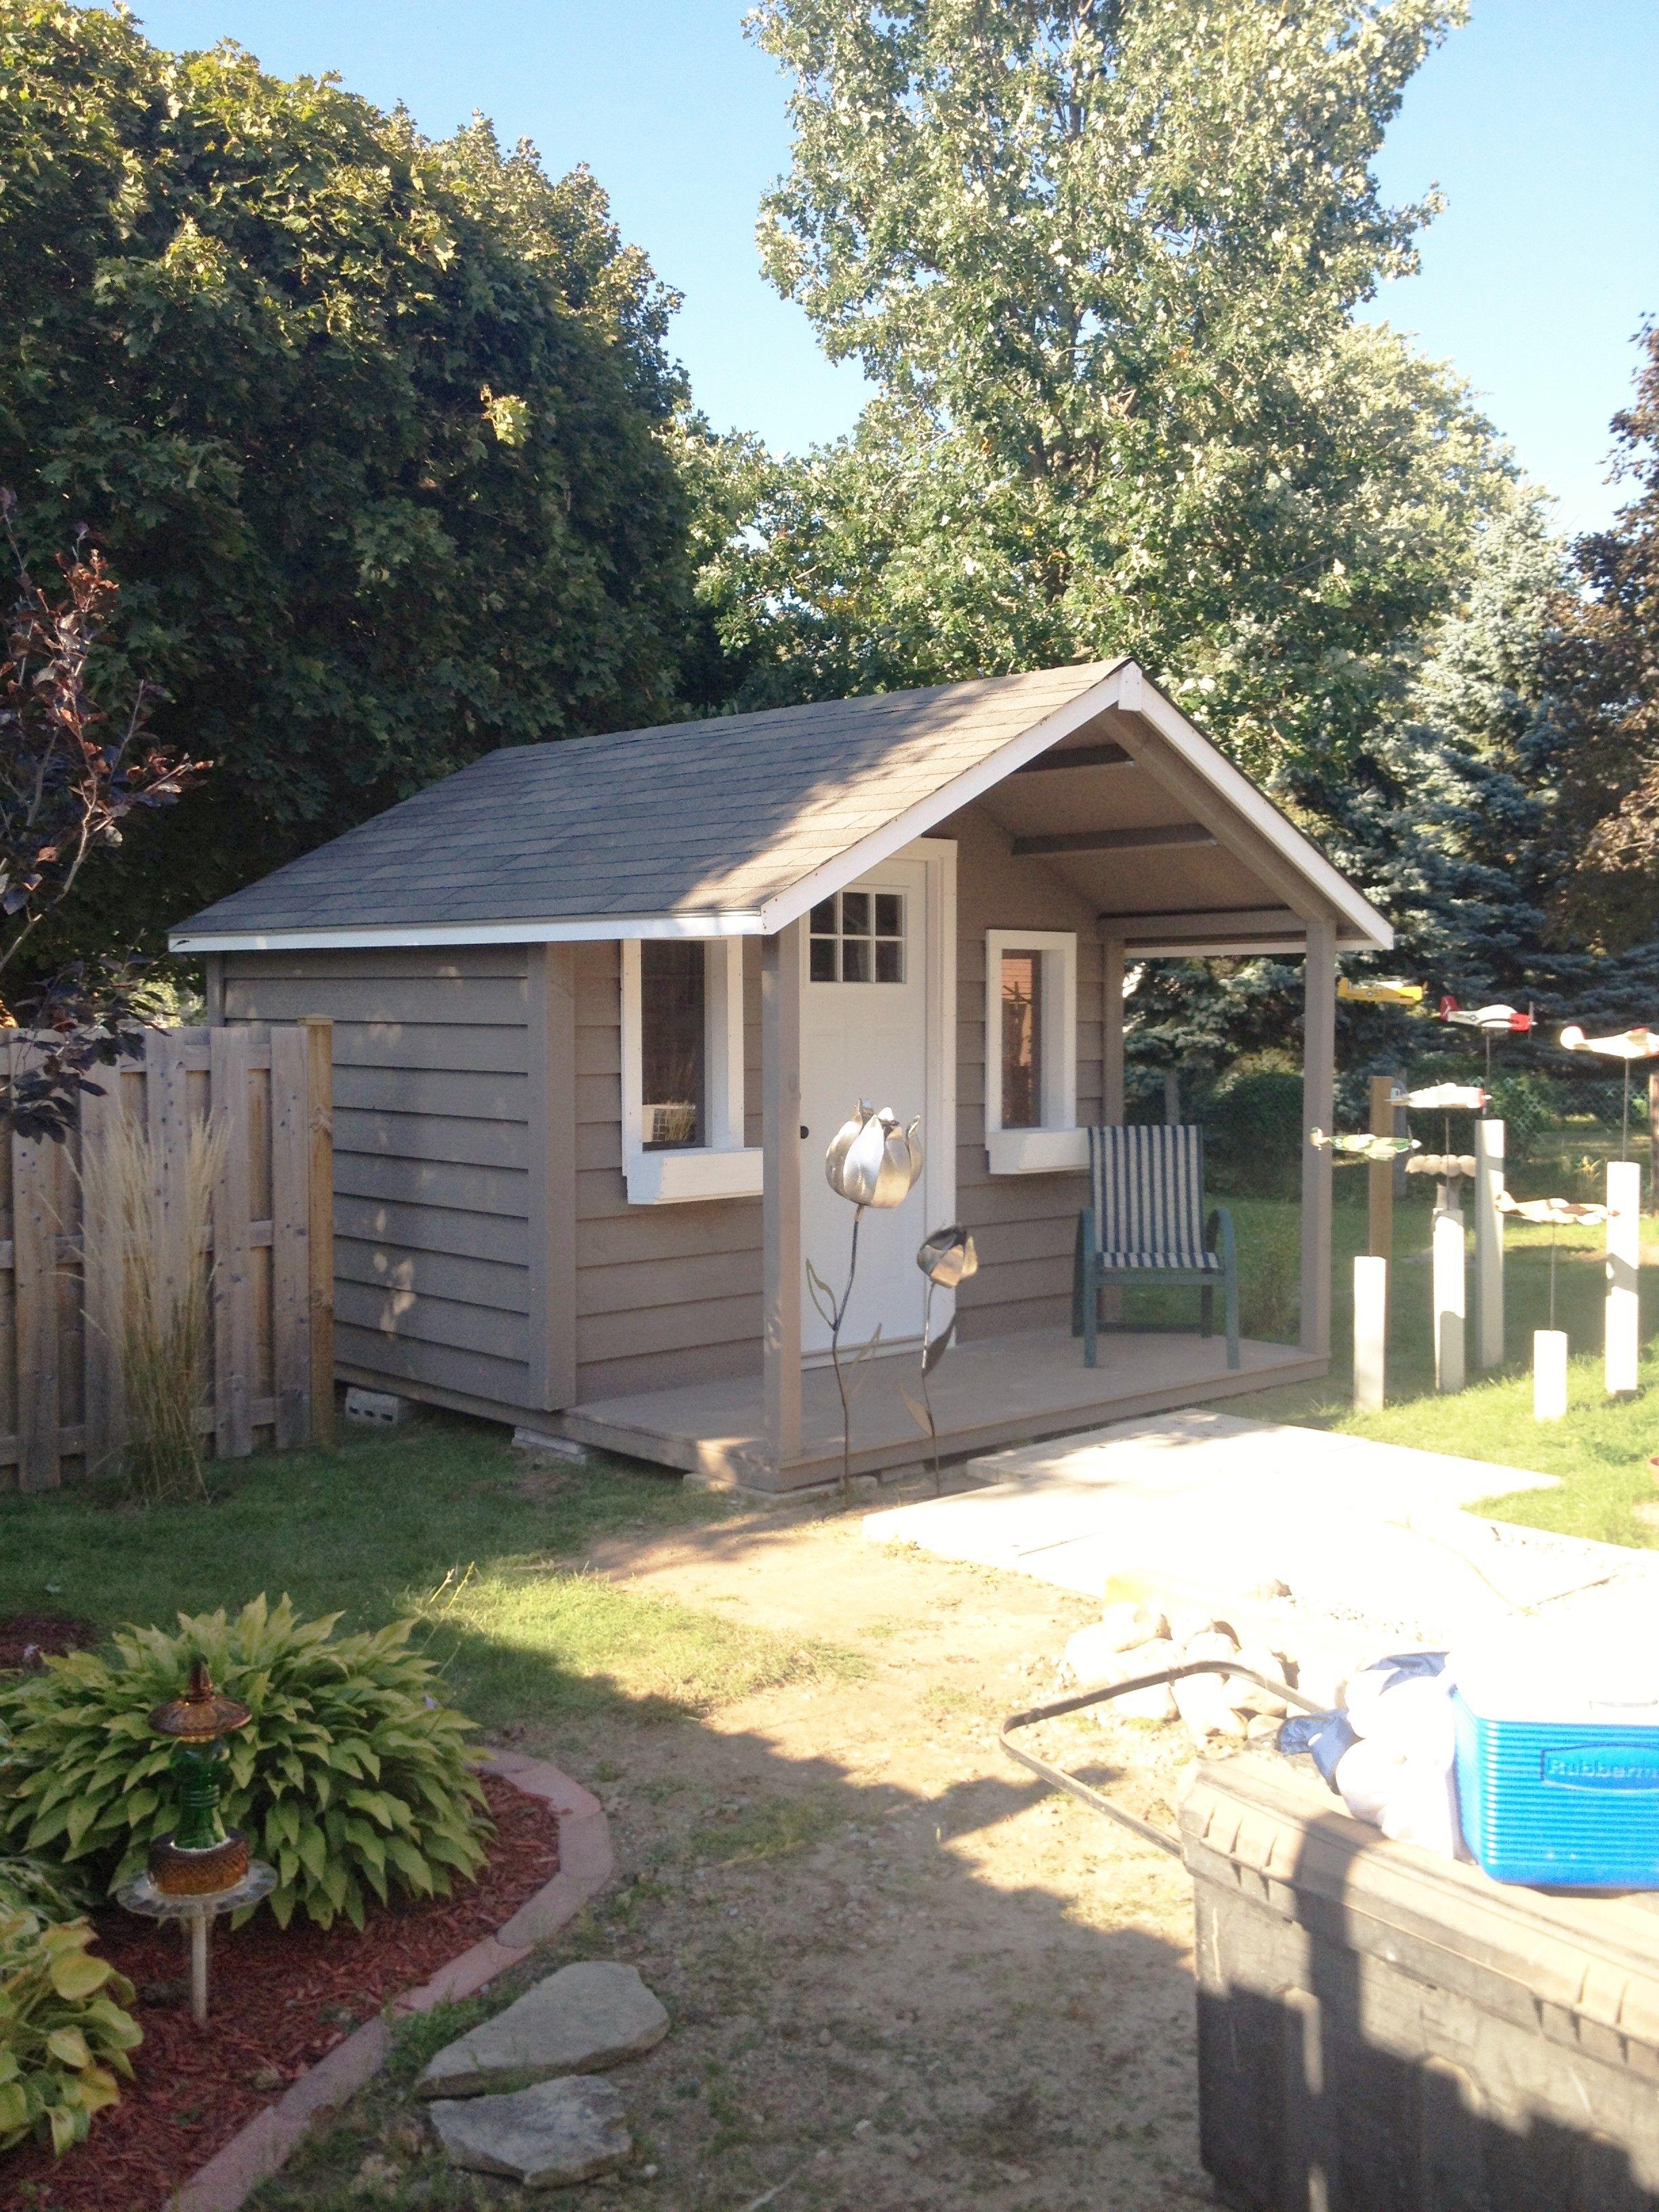 10x10 Medium Classic Style Backyard Sheds Backyard Shed Shed With Porch